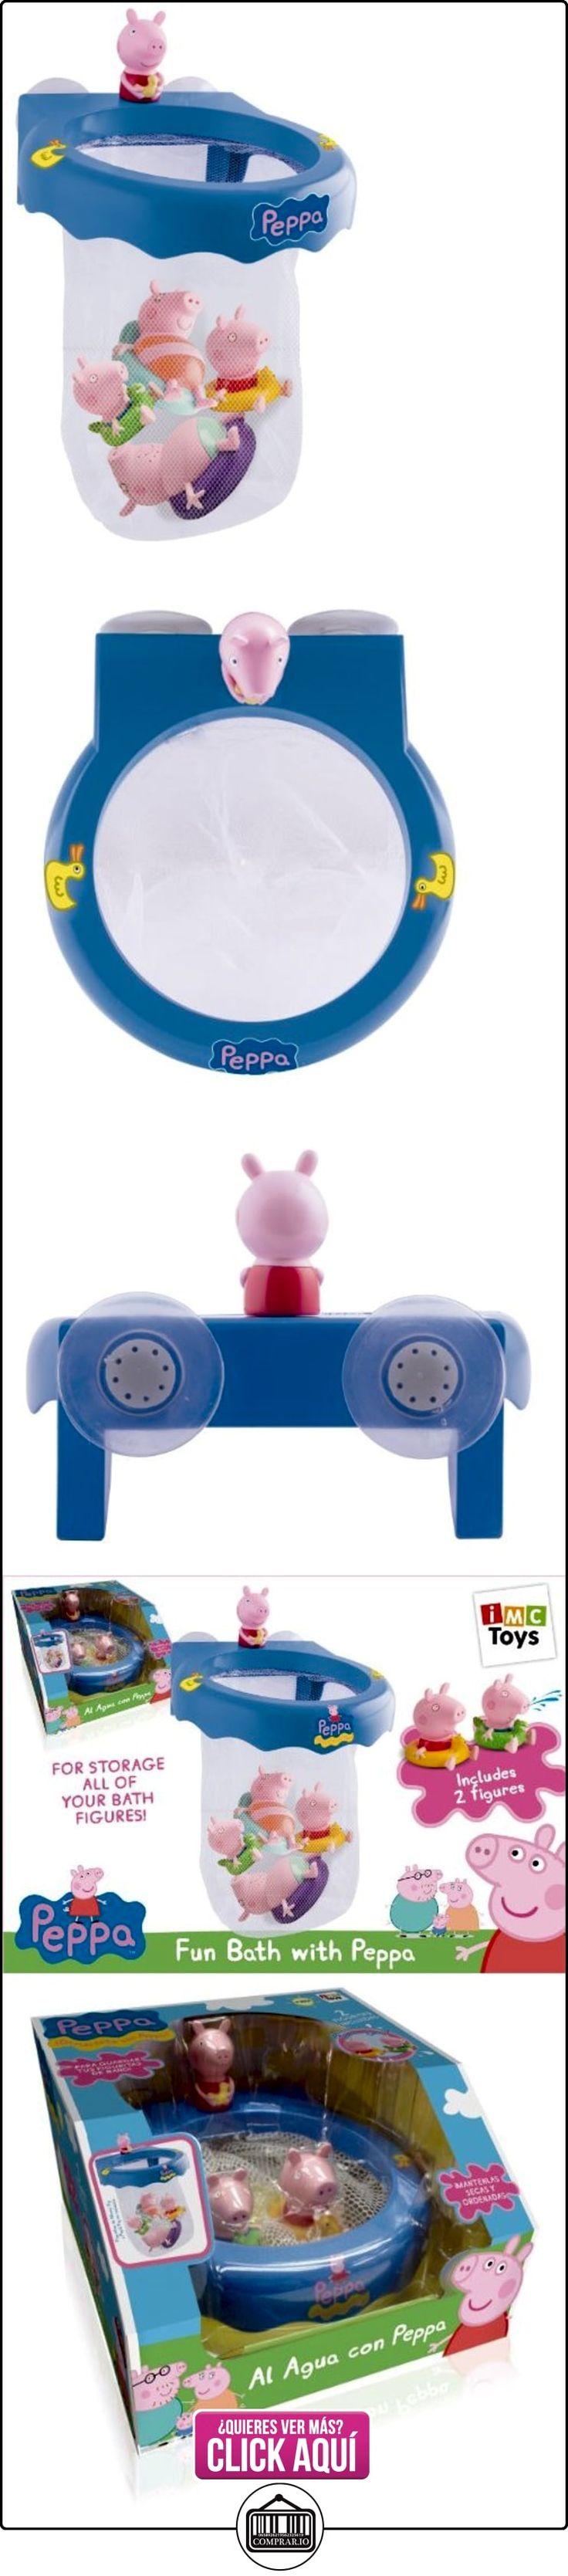 "IMC Toys - Peppa Pig ""Al agua con Peppa"", juguete de baño (360112)  ✿ Peppa Pig - Peppa La Cerdita ✿ ▬► Ver oferta: http://comprar.io/goto/B00DSYC5MG"